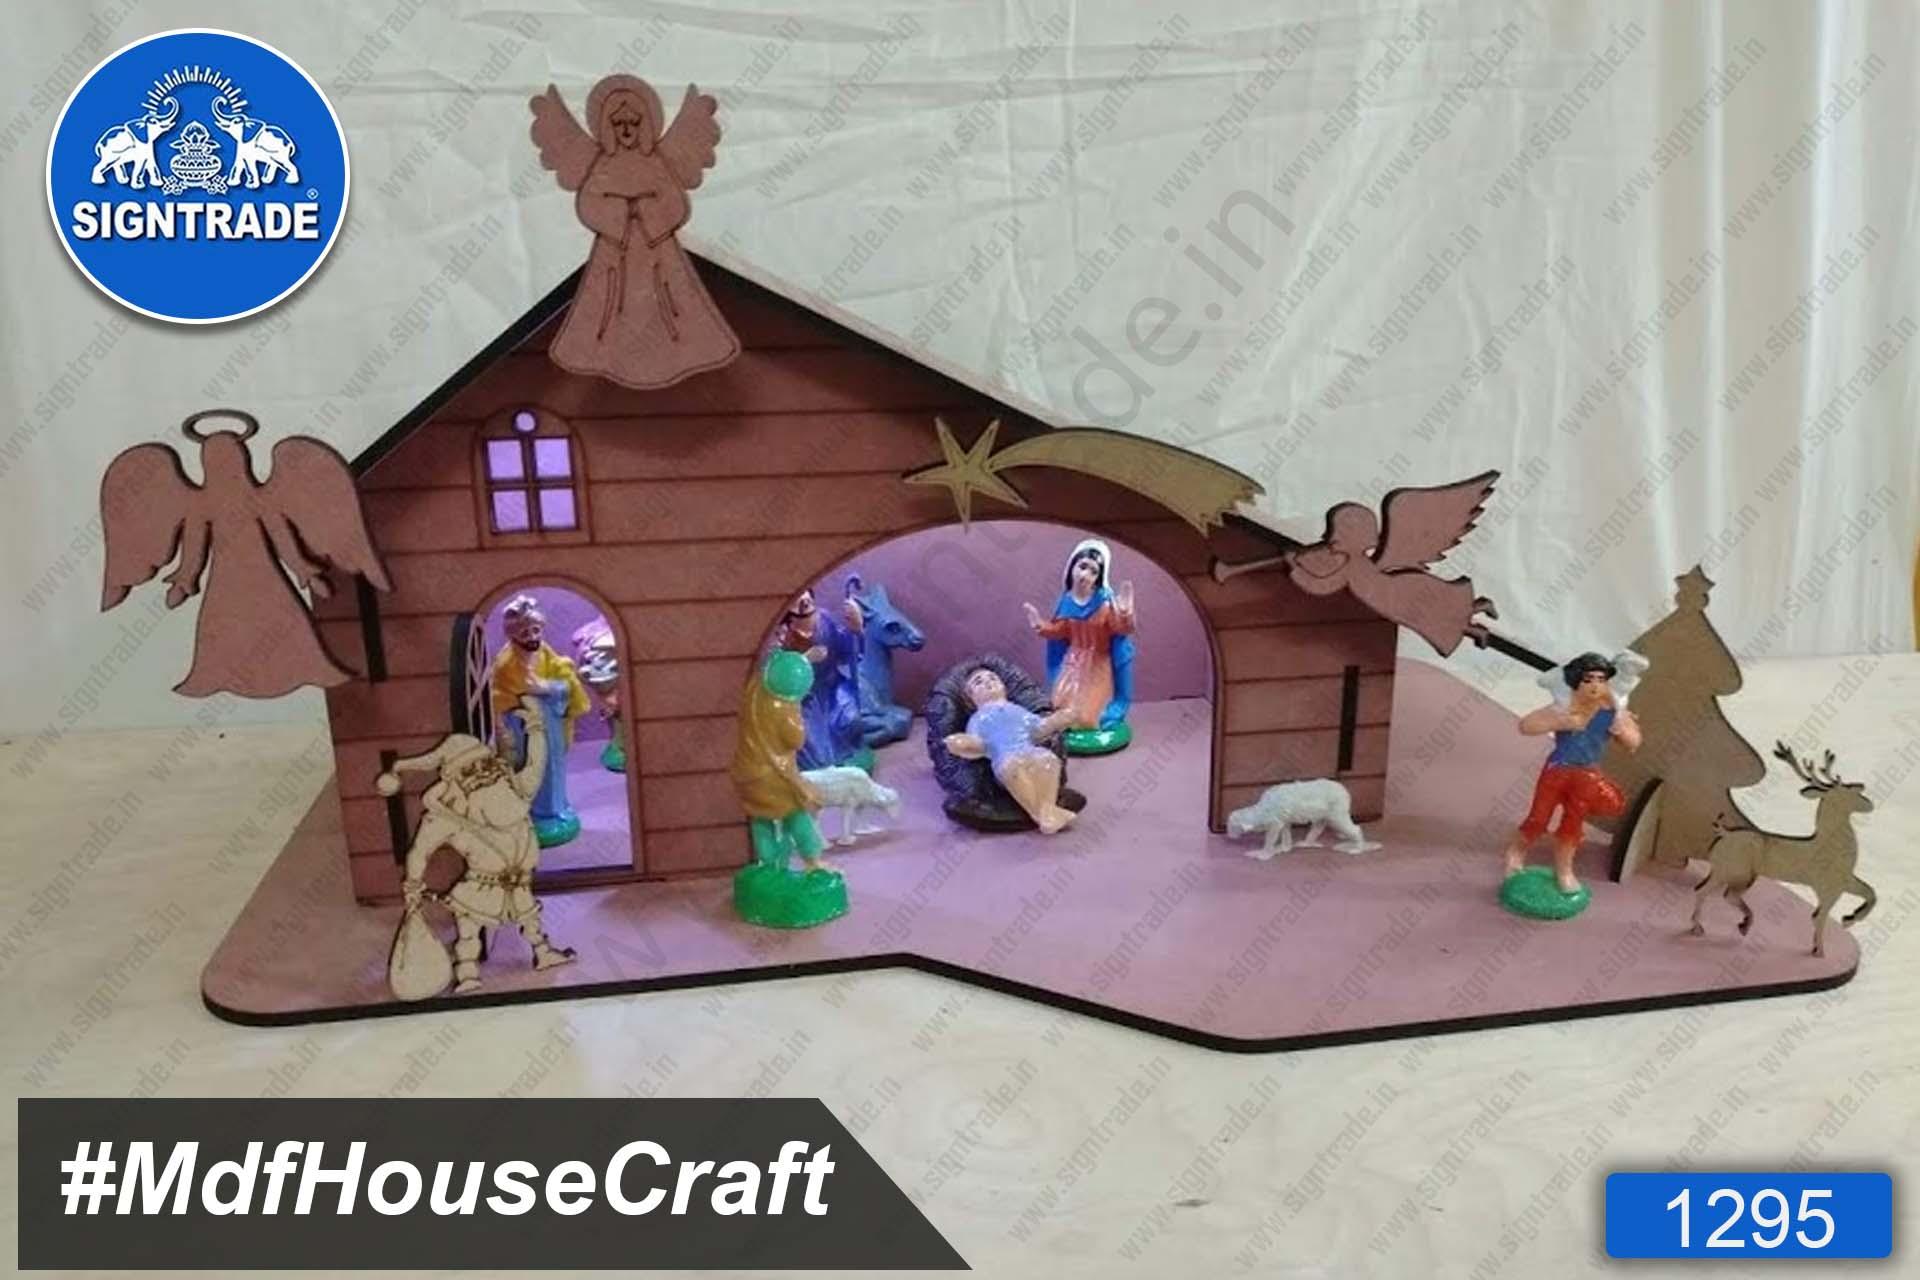 MDF House Craft